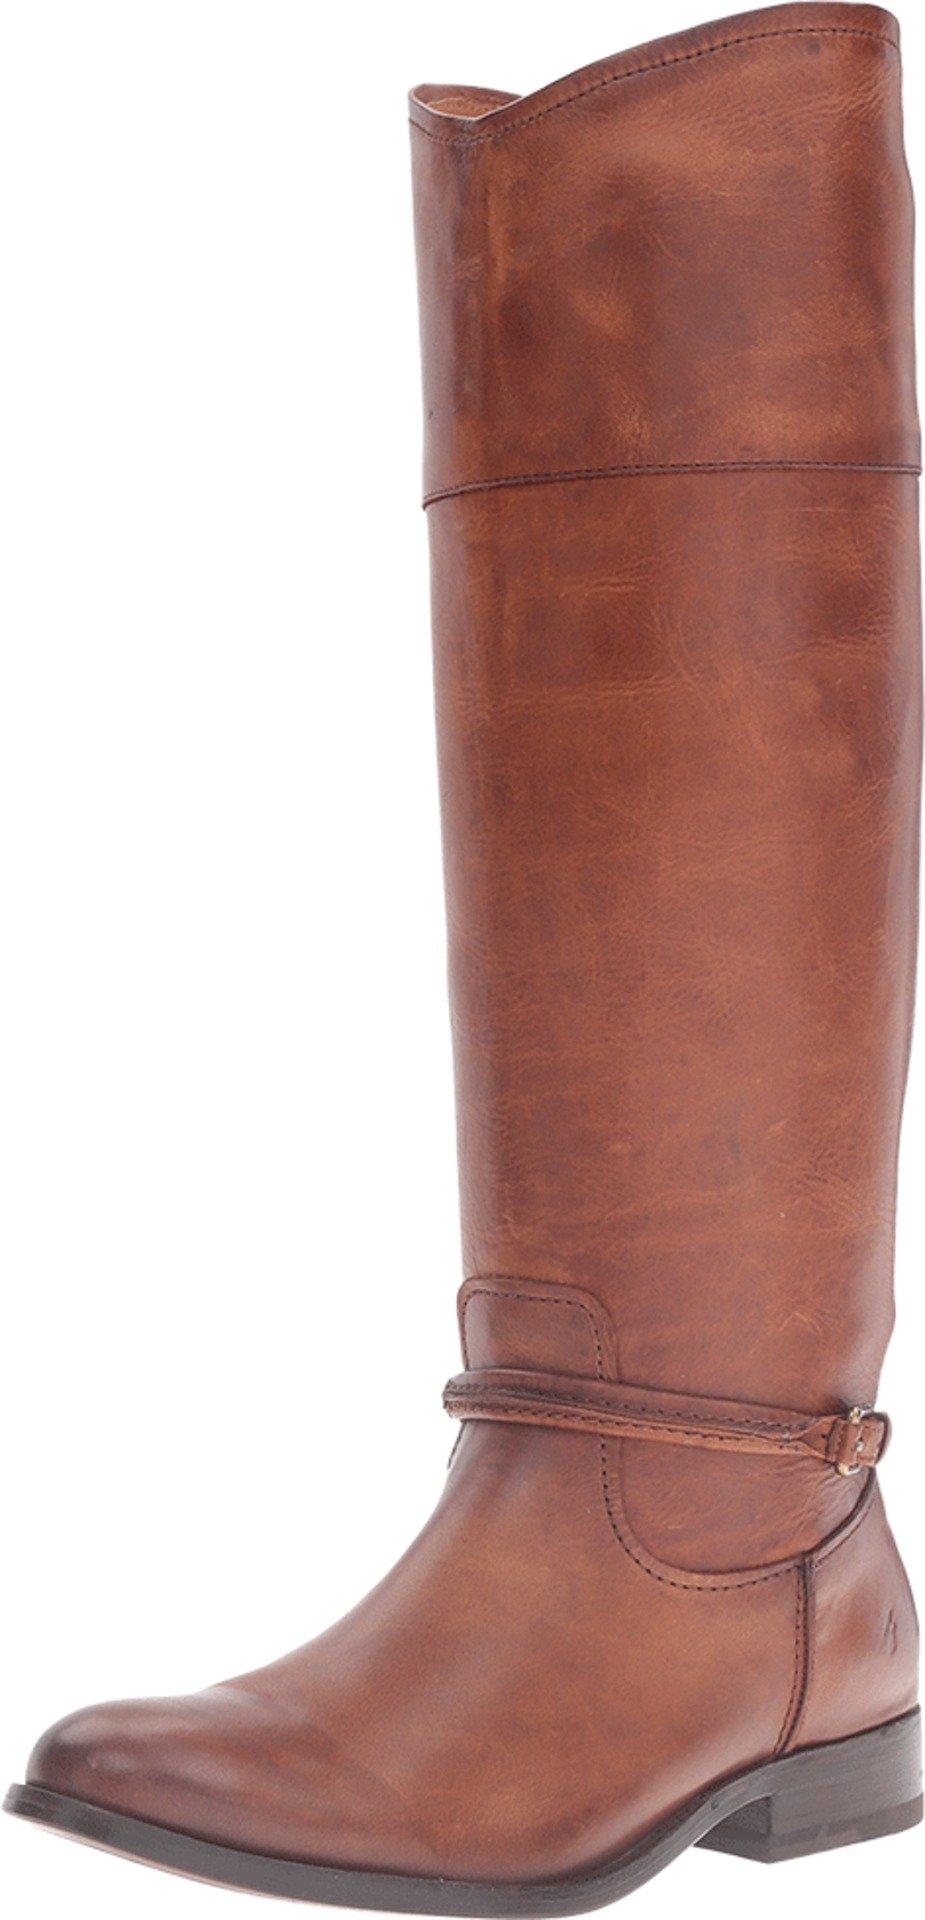 FRYE Women's Melissa Seam Tall Riding Boot, Cognac, 7 M US